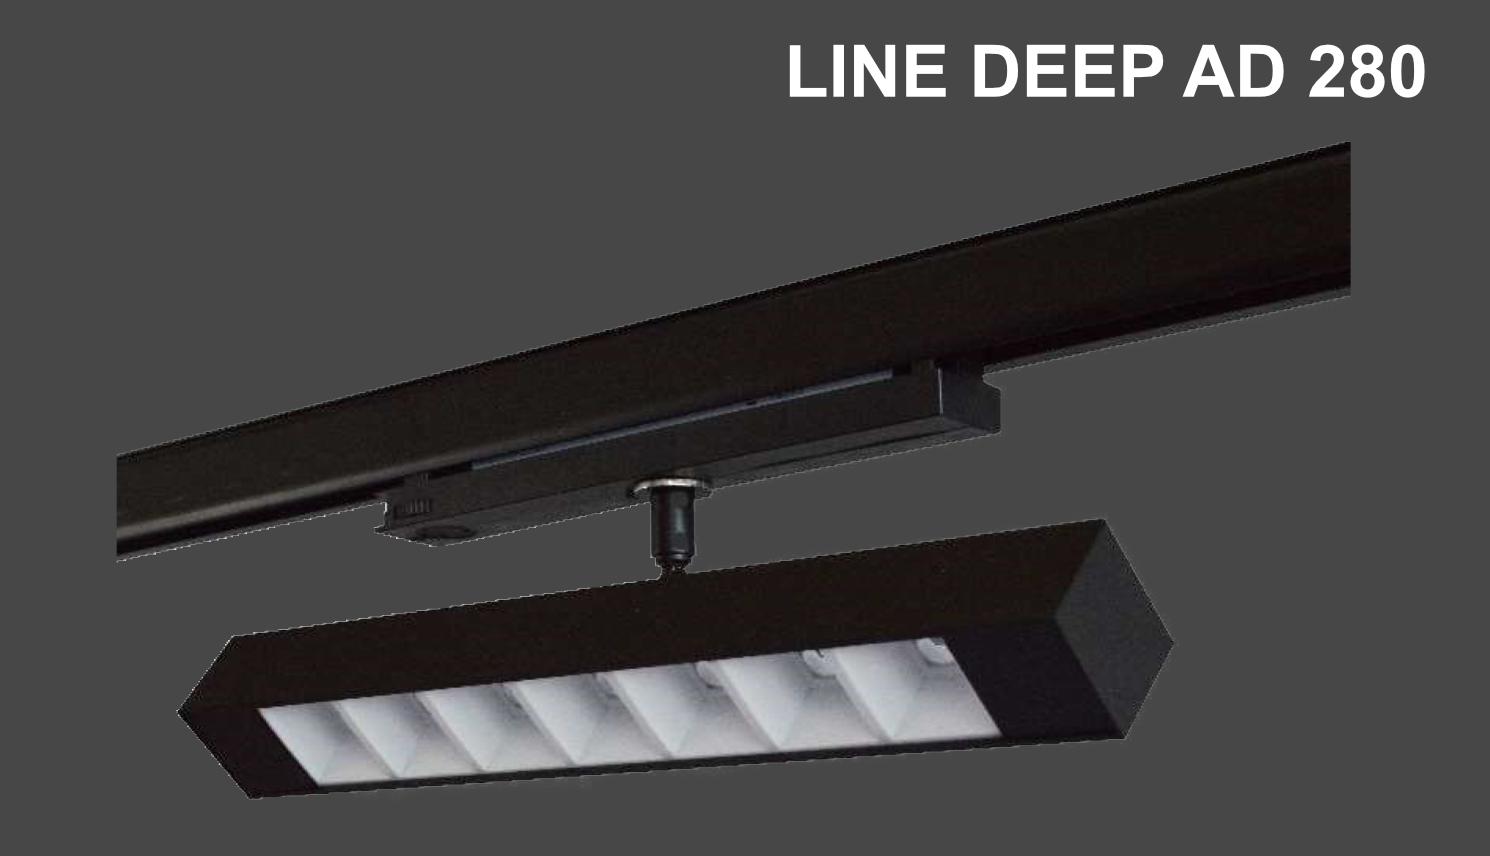 LINE DEEP AD 280